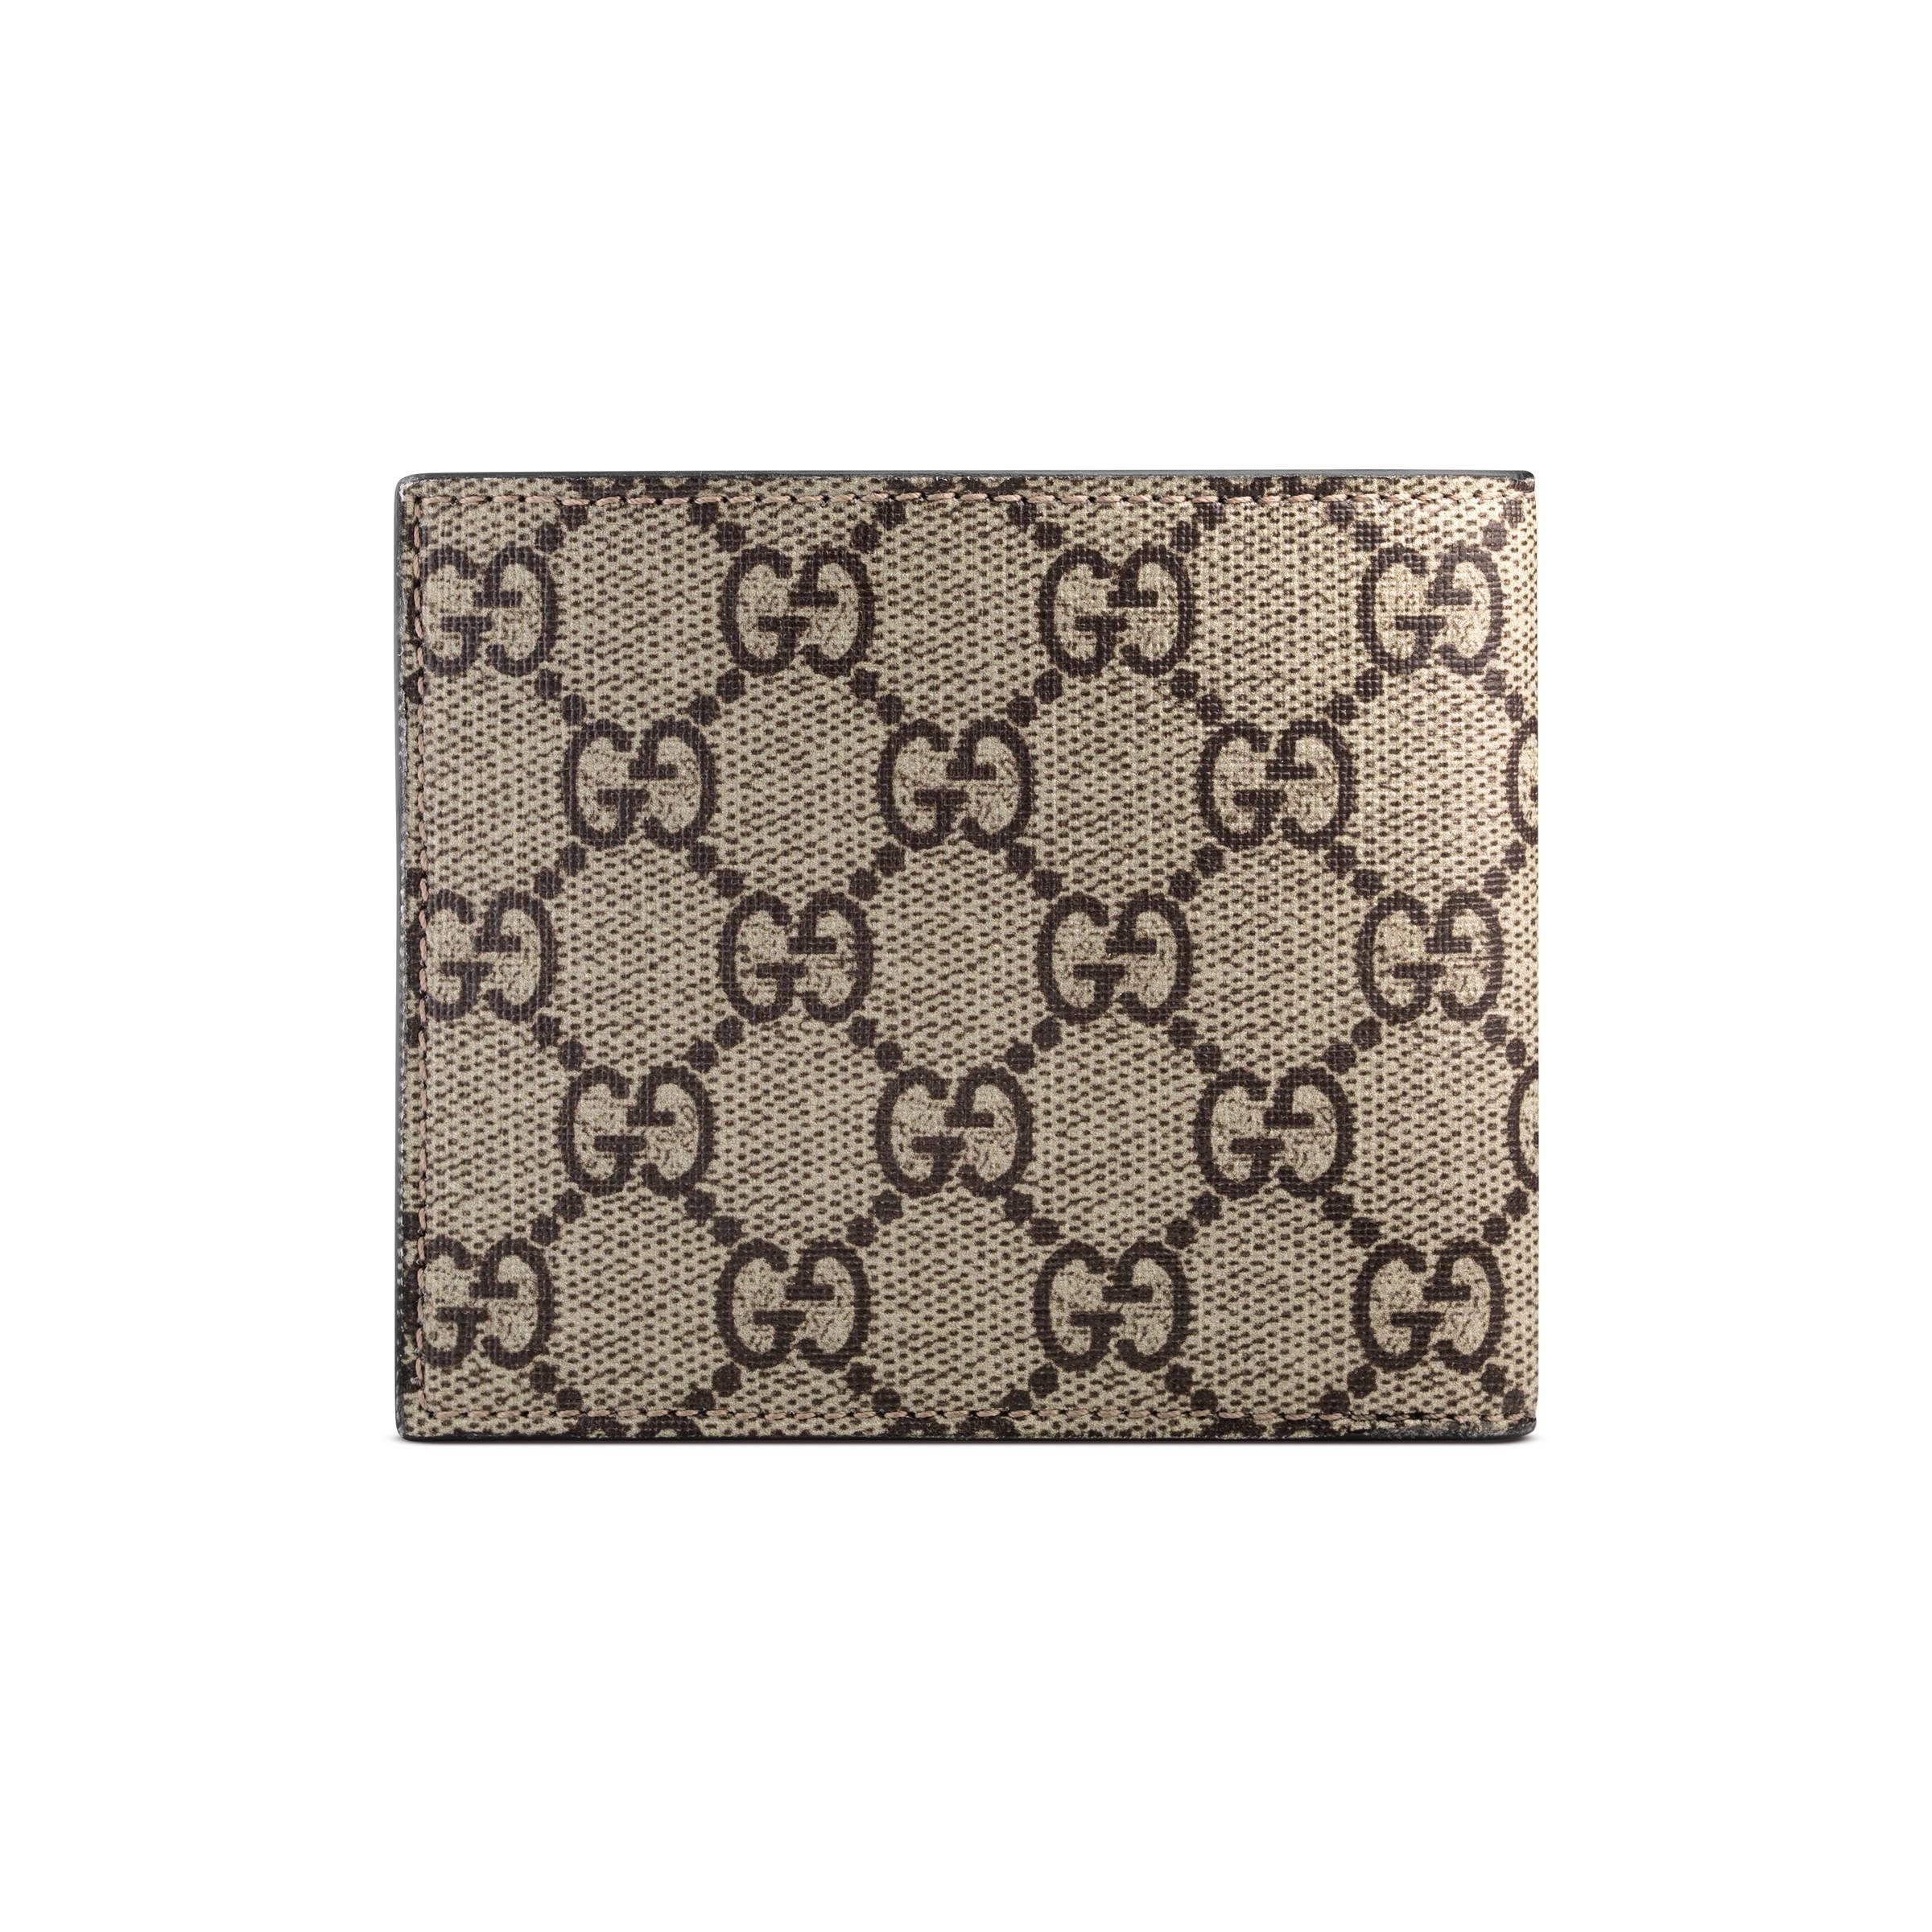 cc549cc81477 Gucci - Natural Bee Print GG Supreme Wallet for Men - Lyst. View fullscreen